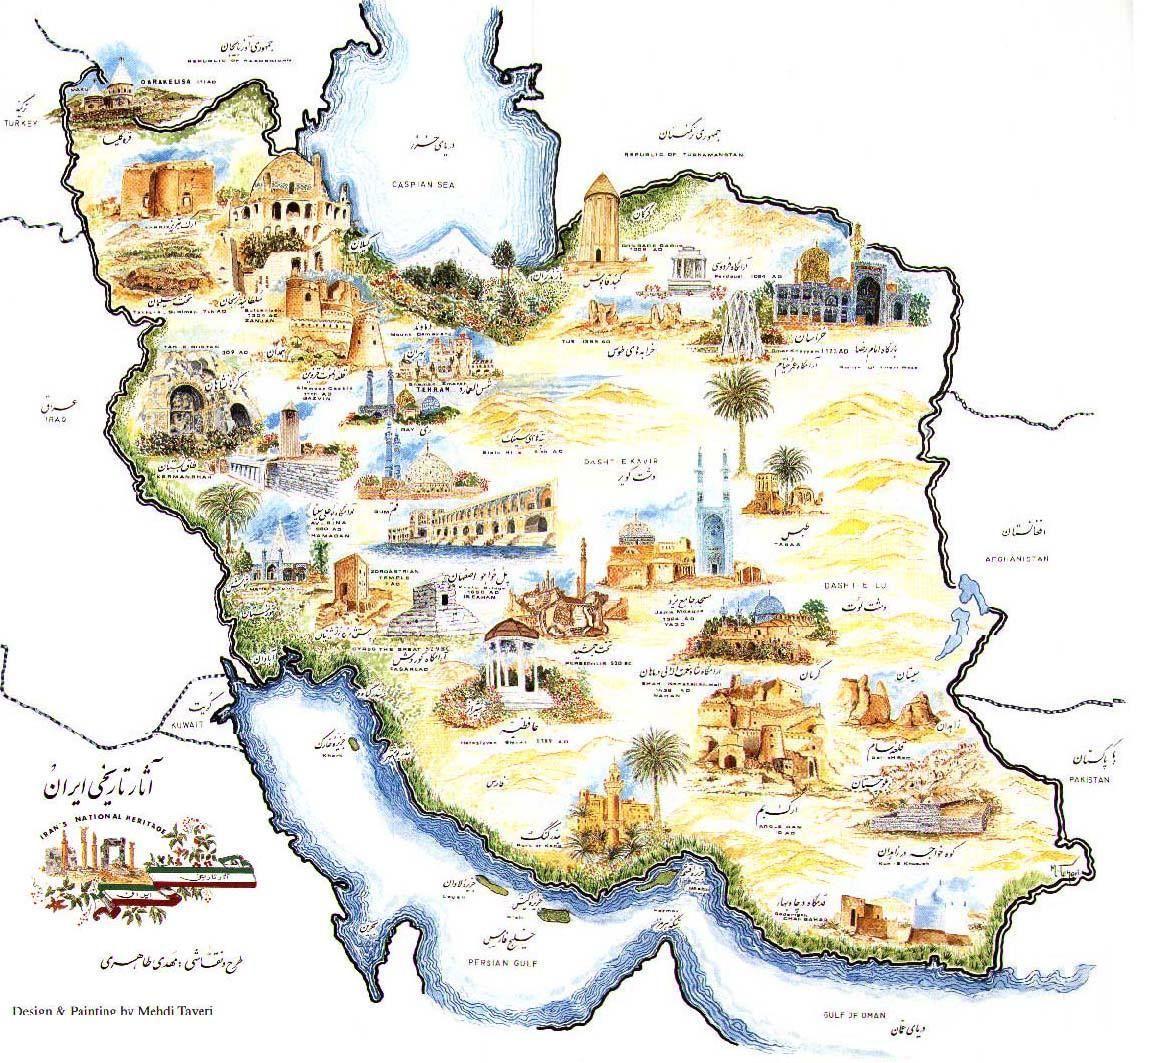 Iran map | Maps in 2019 | Iran, Iran travel, Iranian art Map Iran on brazil map, saudi arabia, qatar map, france map, ali khamenei, mahmoud ahmadinejad, china map, turkey map, israel map, japan map, georgia map, europe map, nigeria map, persian gulf, saudi arabia map, russia map, greece map, persia map, iraq map, spain map, germany map, mexico map, persian language, persian map, united states map, persian people,